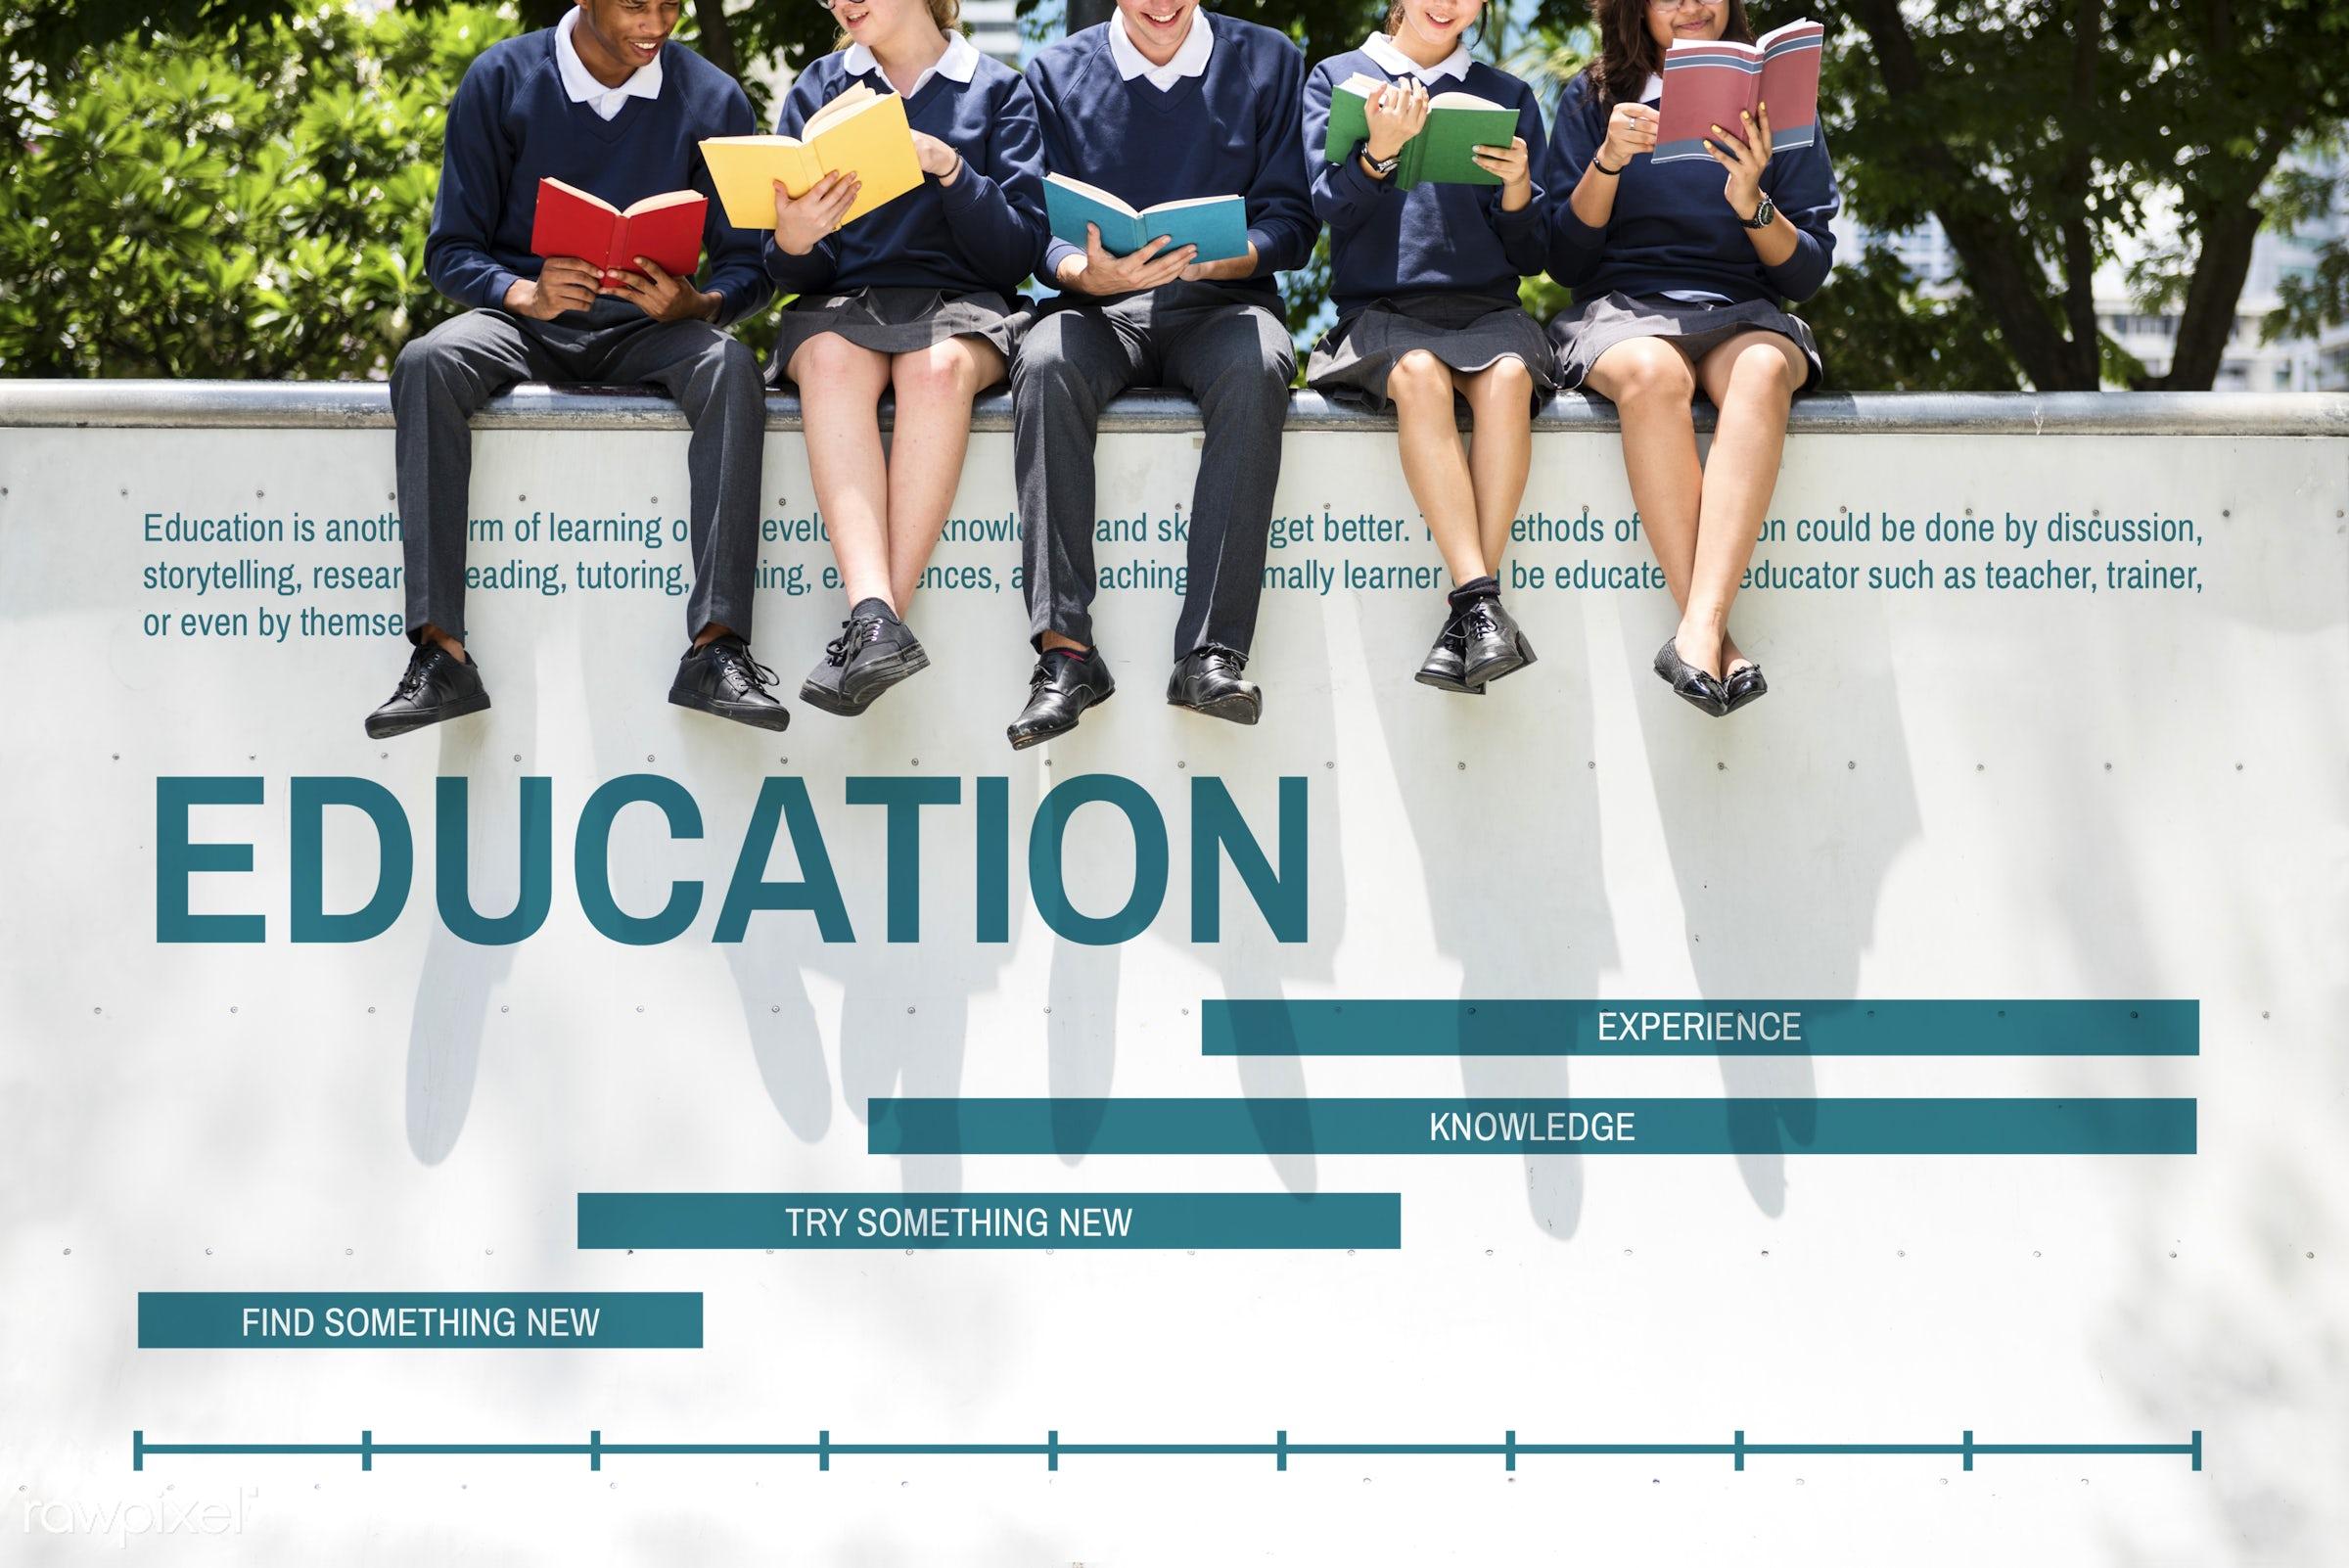 books, class, college, communication, degree, development, discussion, diversity, education, experience, friends, friendship...